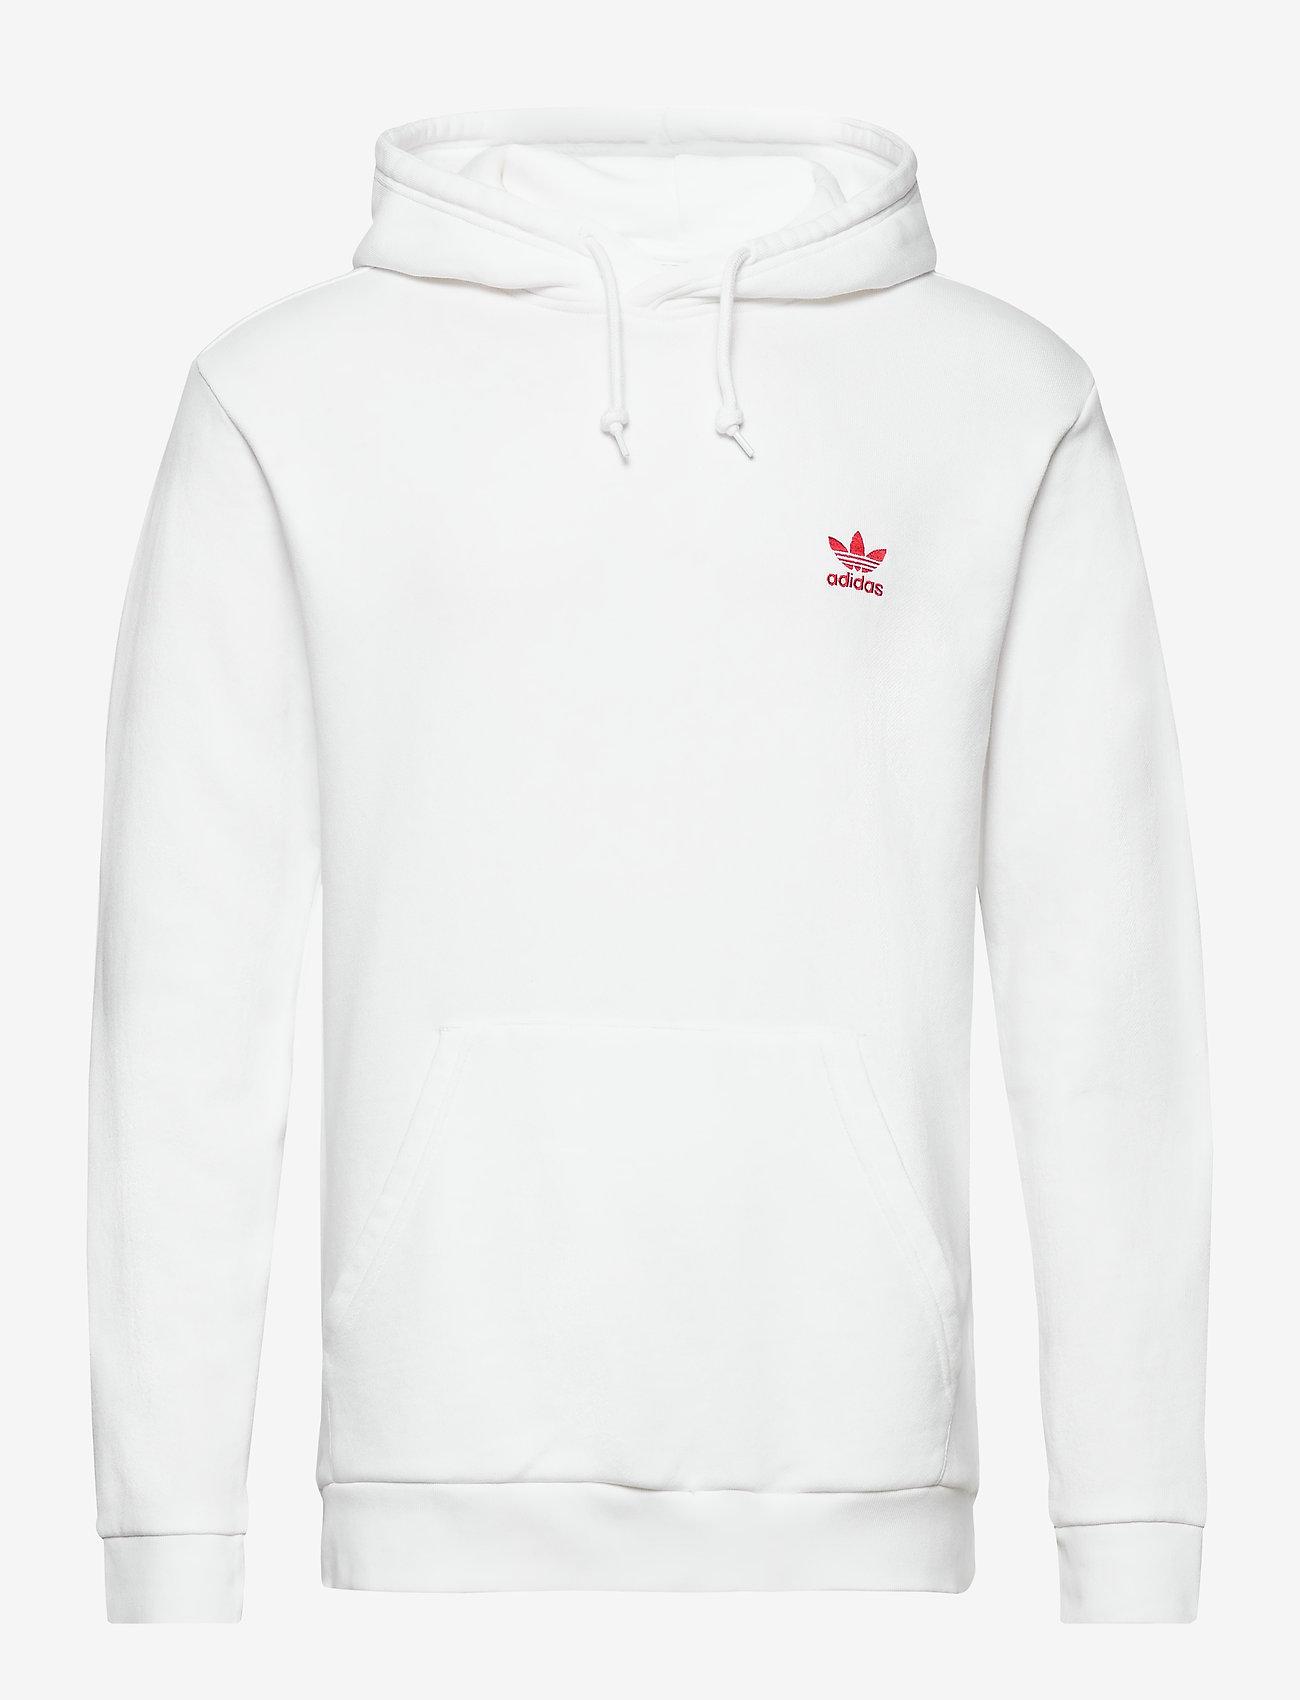 Essential Hoody (White/scarle) - adidas Originals EmR1qq